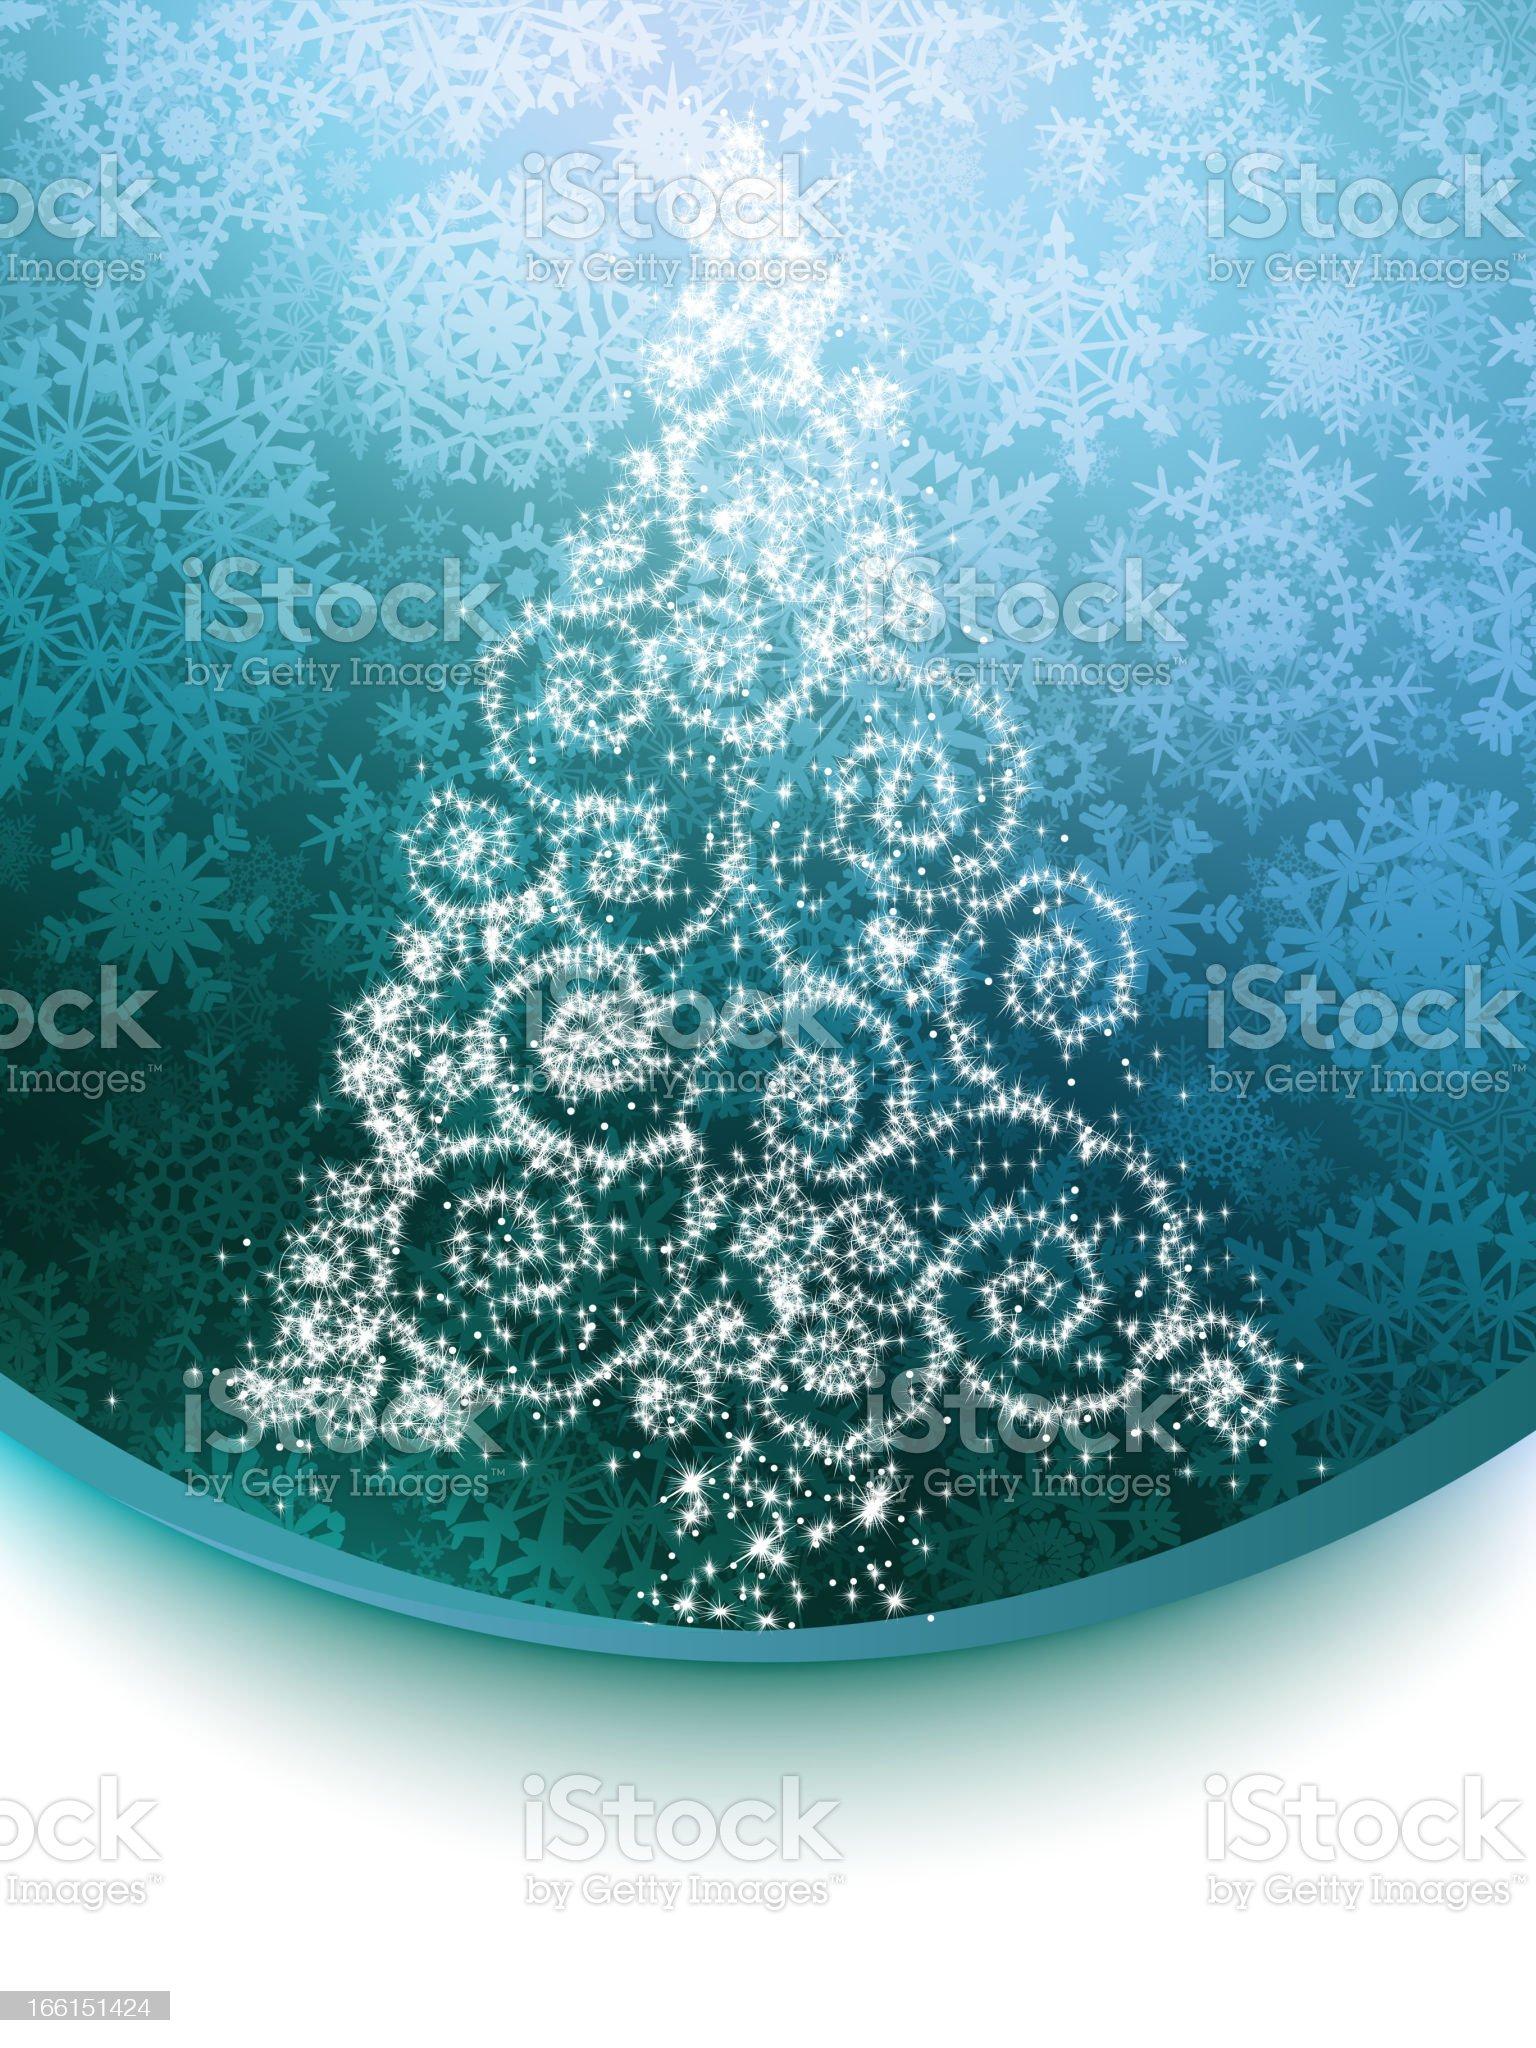 Elegant christmas background. EPS 8 royalty-free stock vector art